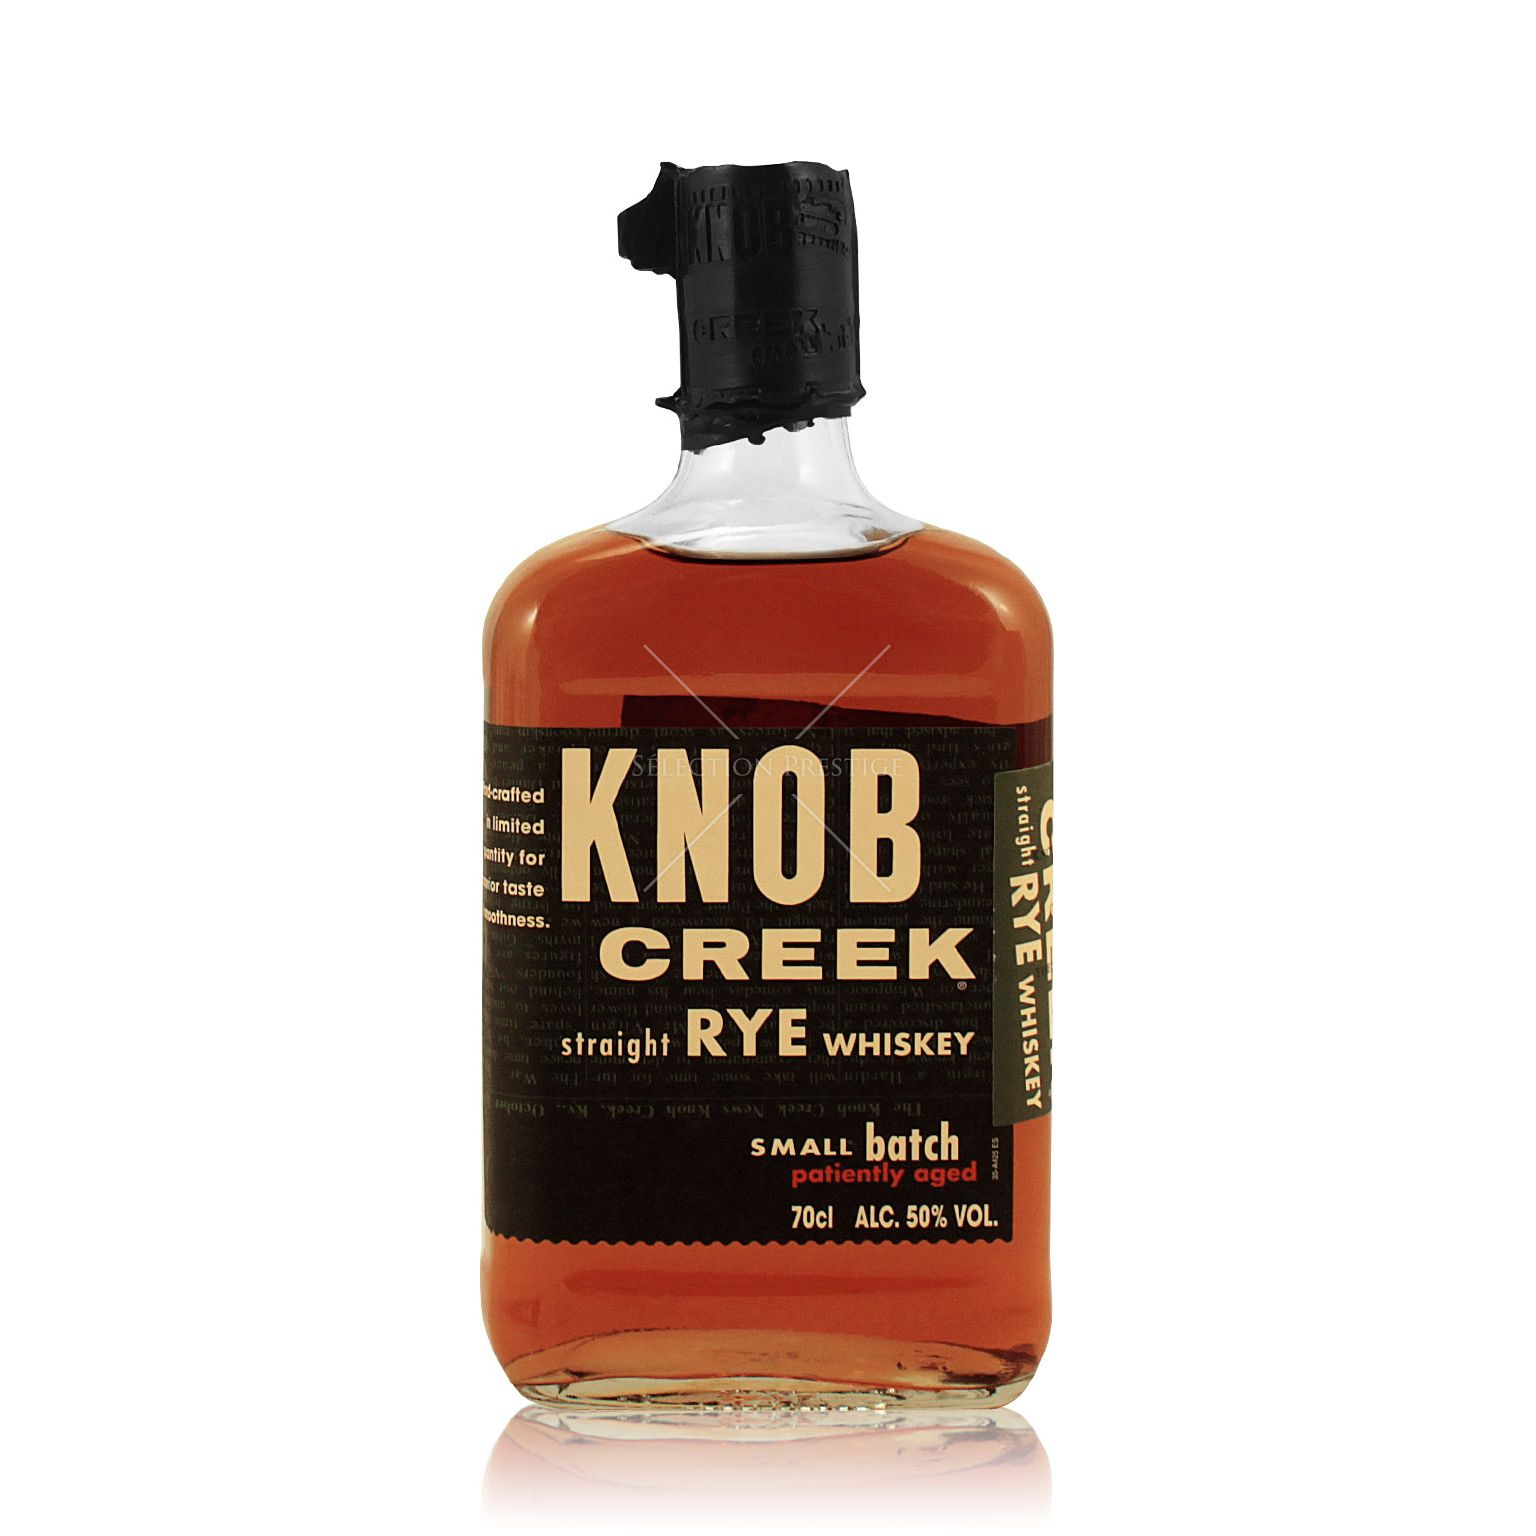 Knob Creek Kentucky Straight Rye Whiskey Small Batch 0.7L ...